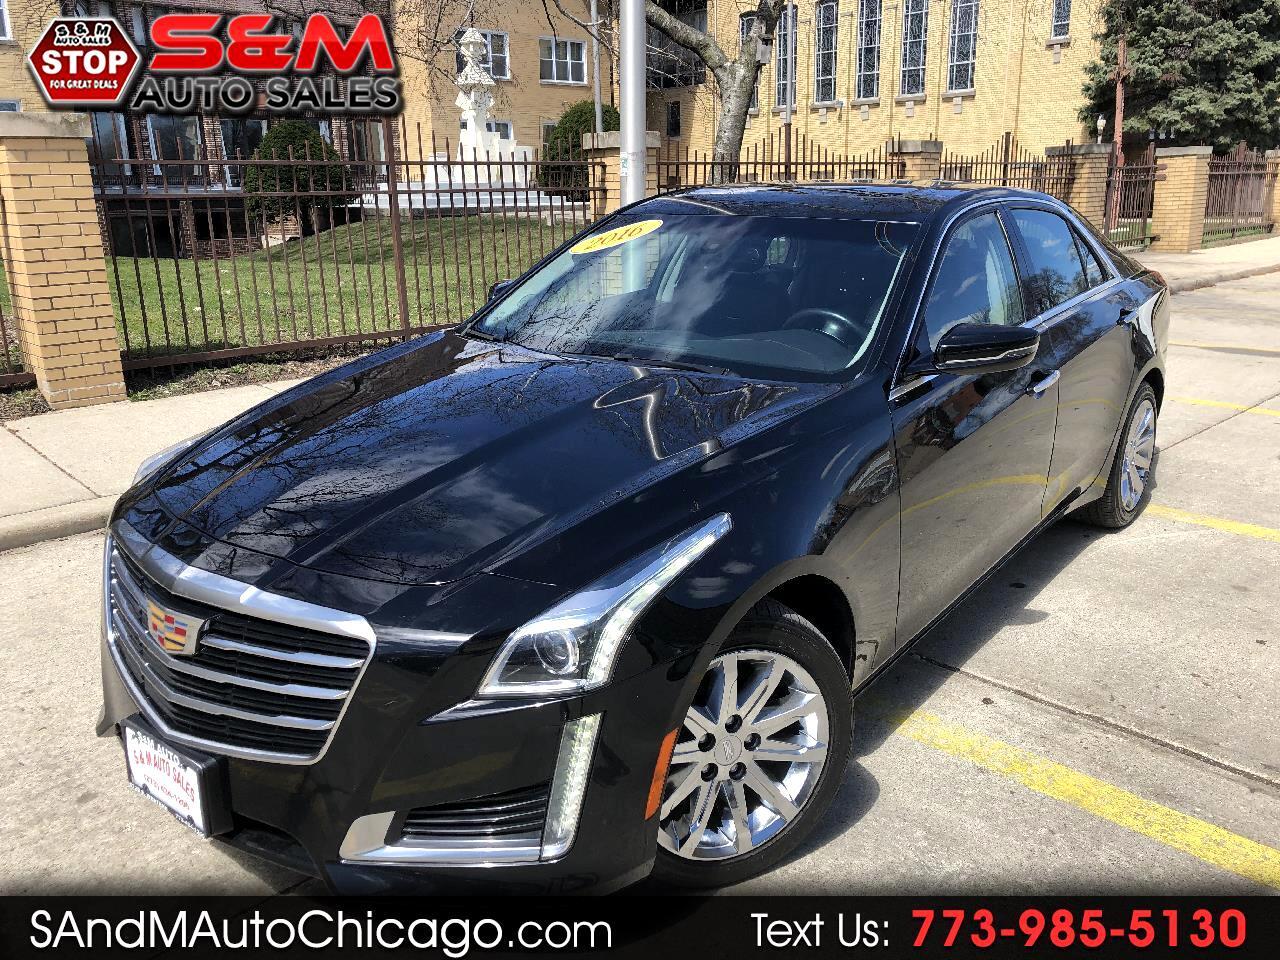 2016 Cadillac CTS Sedan 4dr Sdn 2.0L Turbo AWD